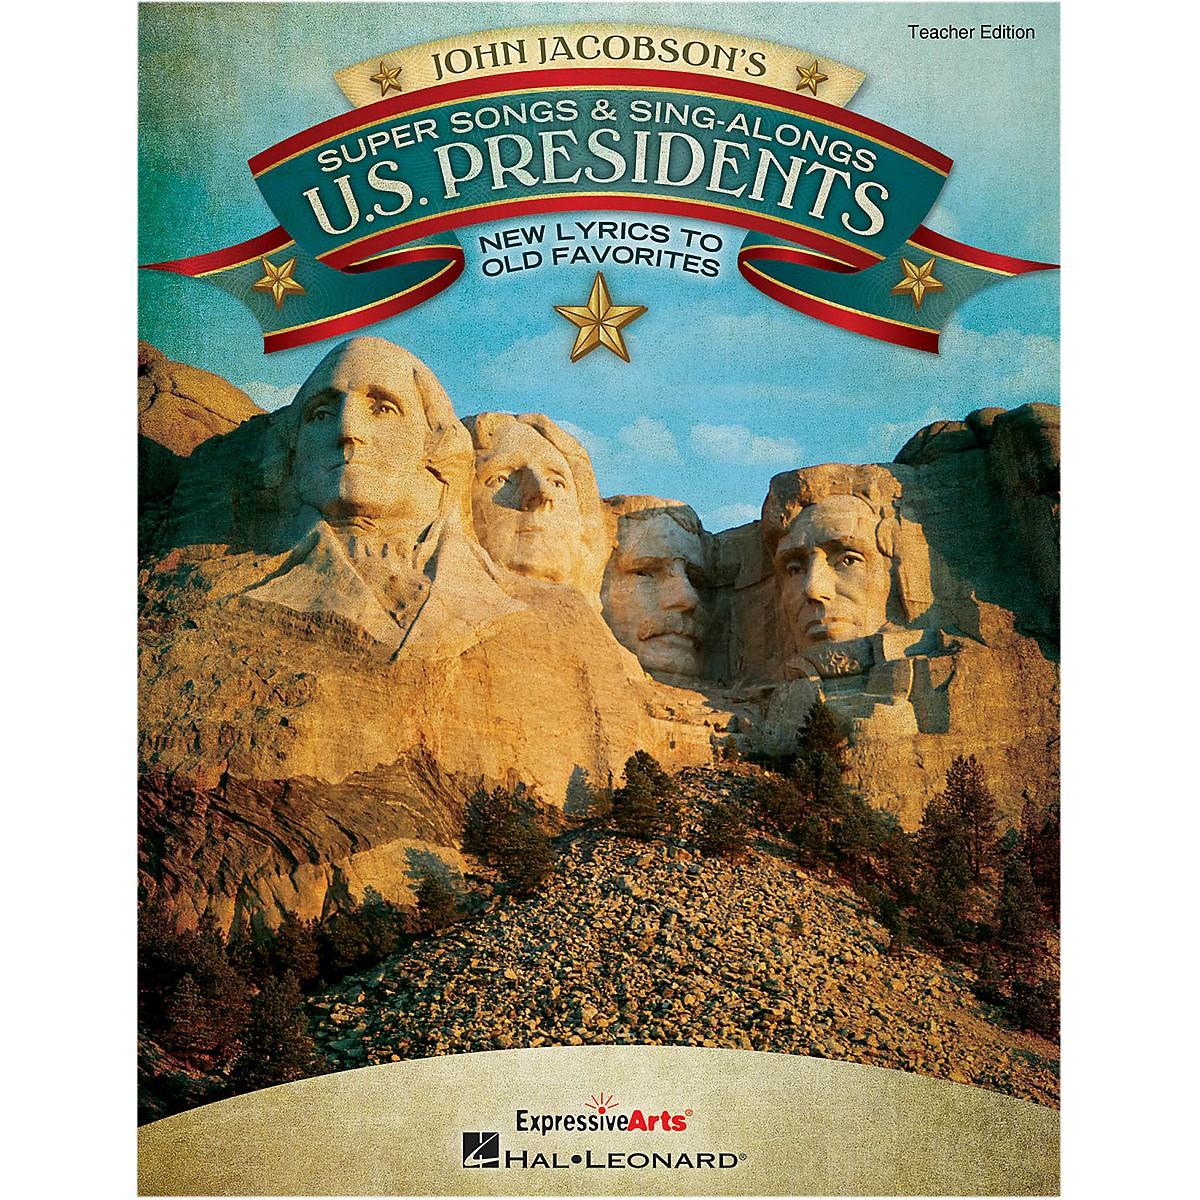 Hal Leonard Super Songs And Sing-Alongs: U.S. Presidents - New Lyrics to Old Favorites Teacher Edition